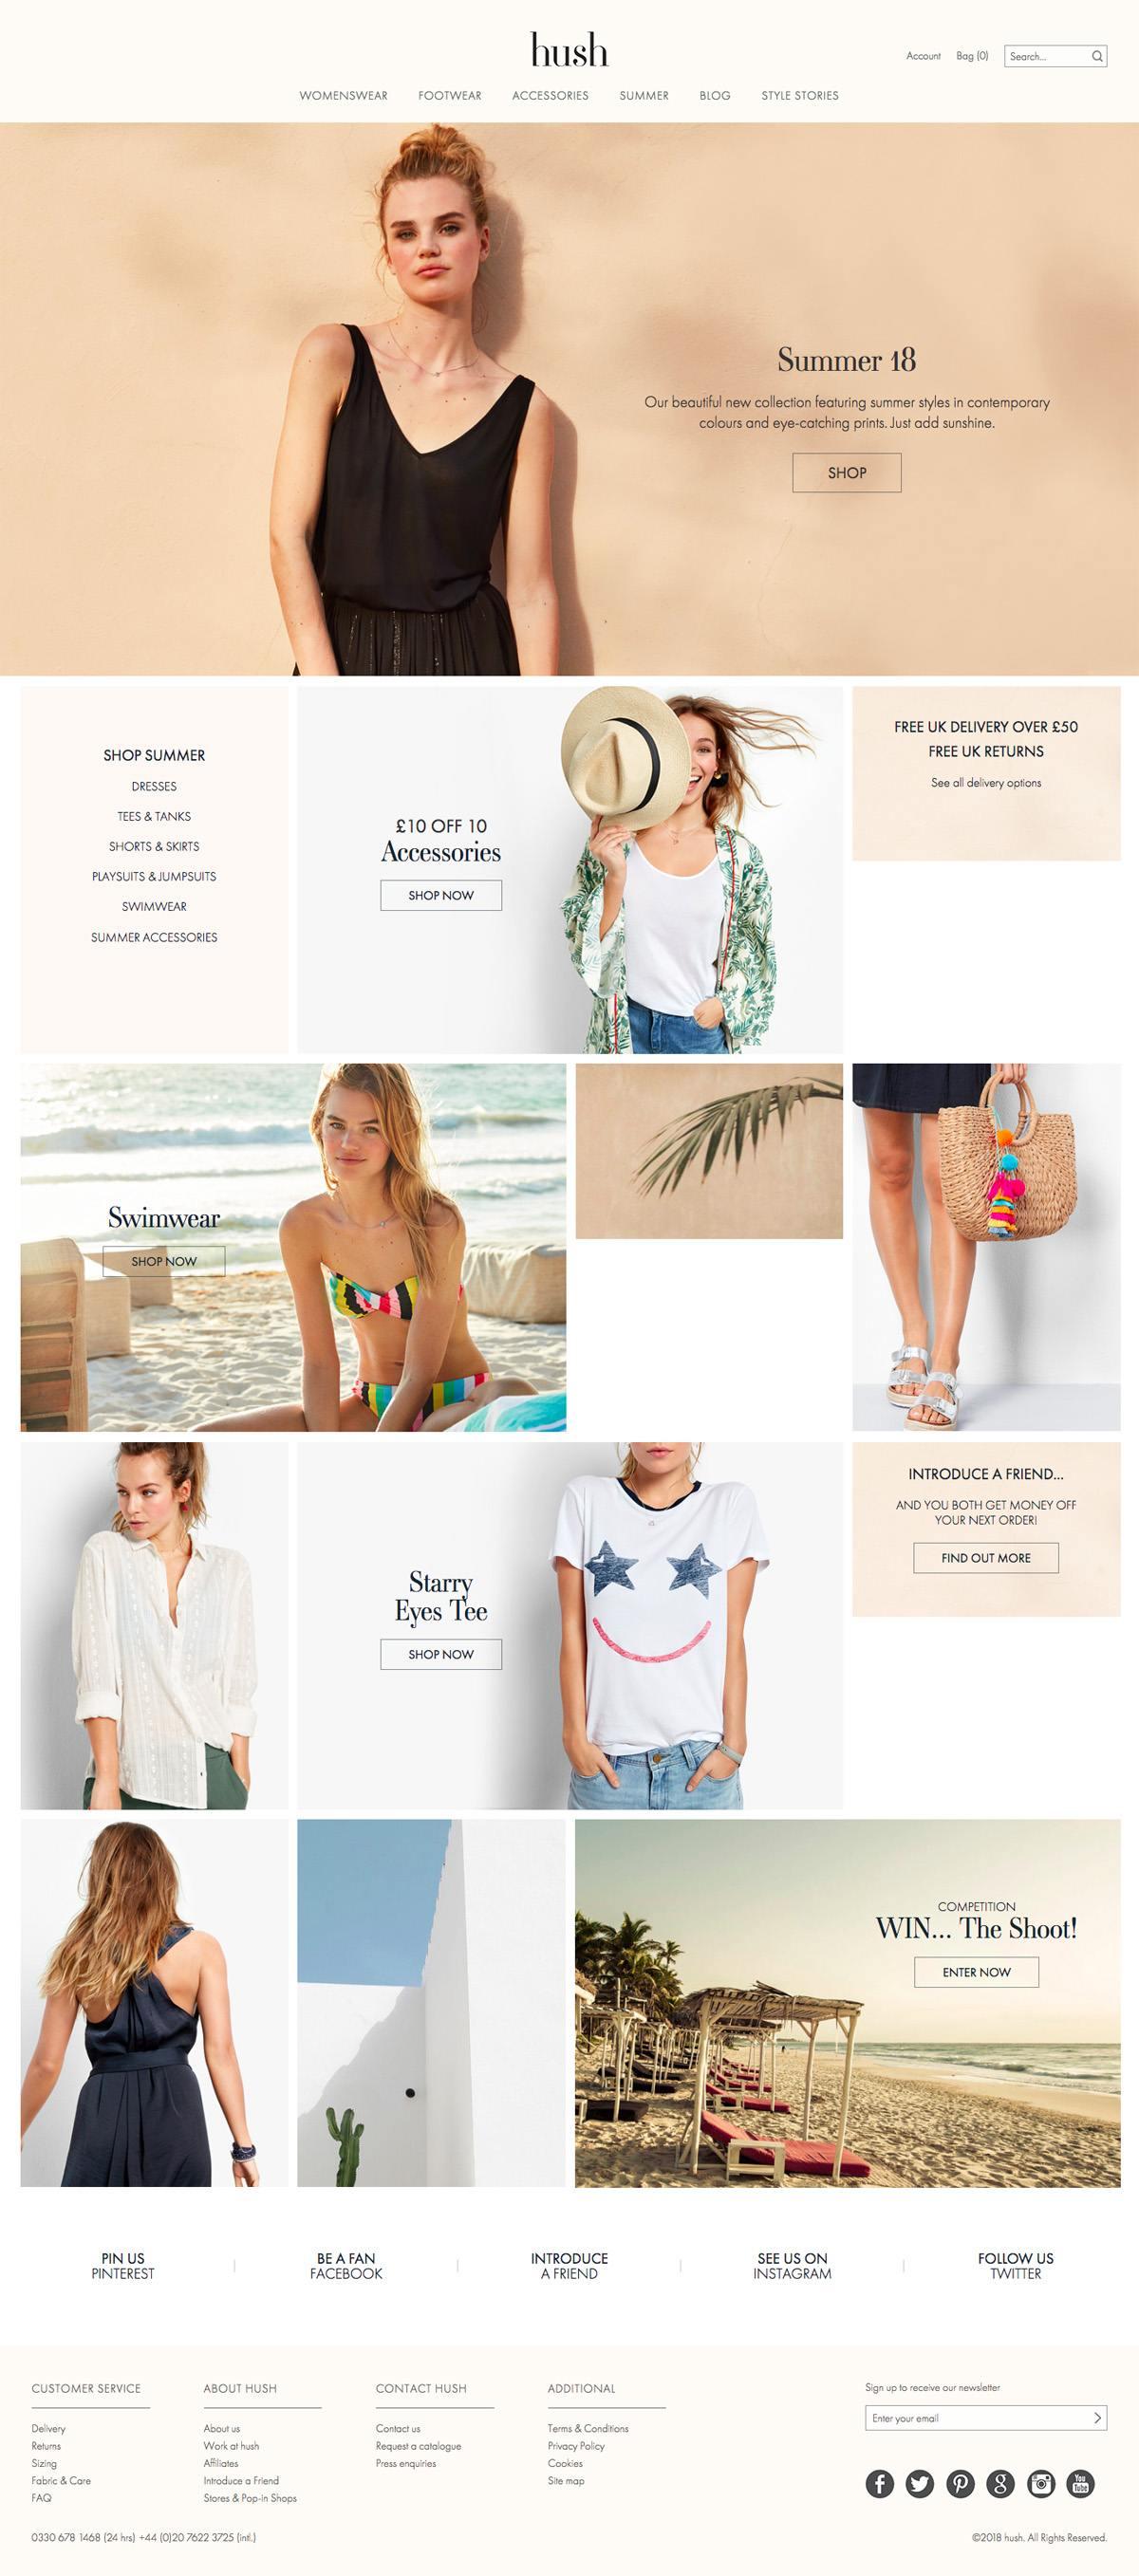 eCommerce website: Hush